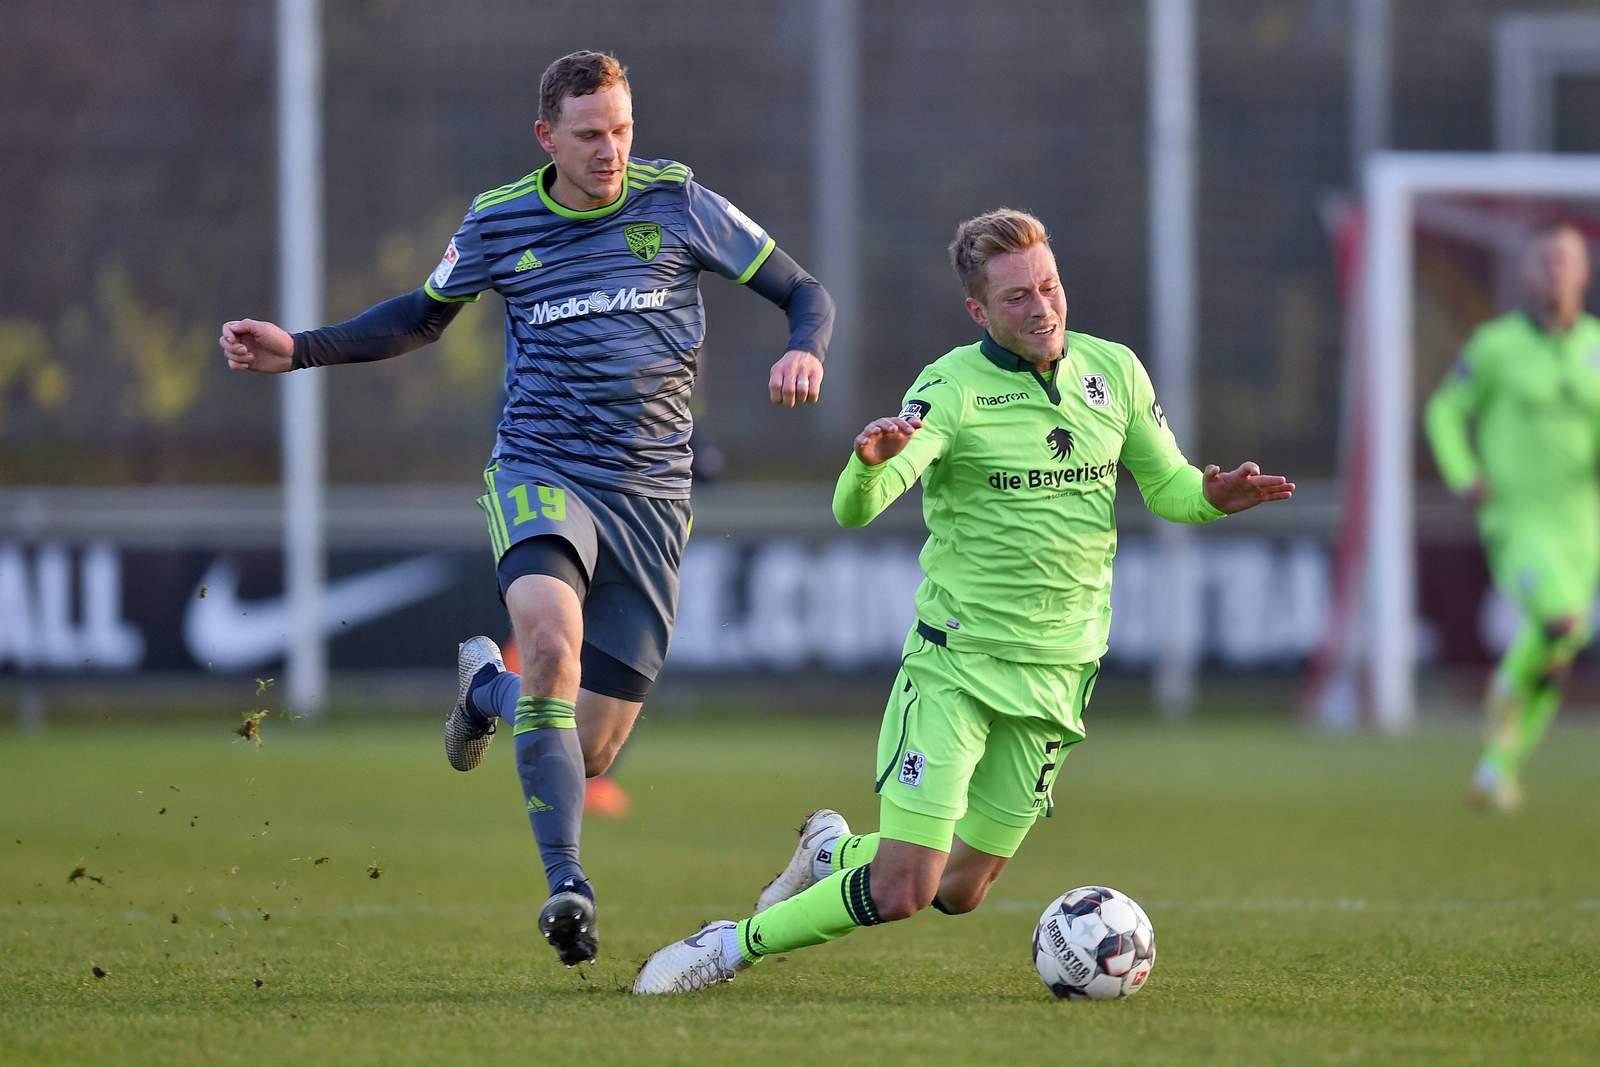 Ingolstadts Marcel Gaus (l.) gegen Münchens Marius Willsch.